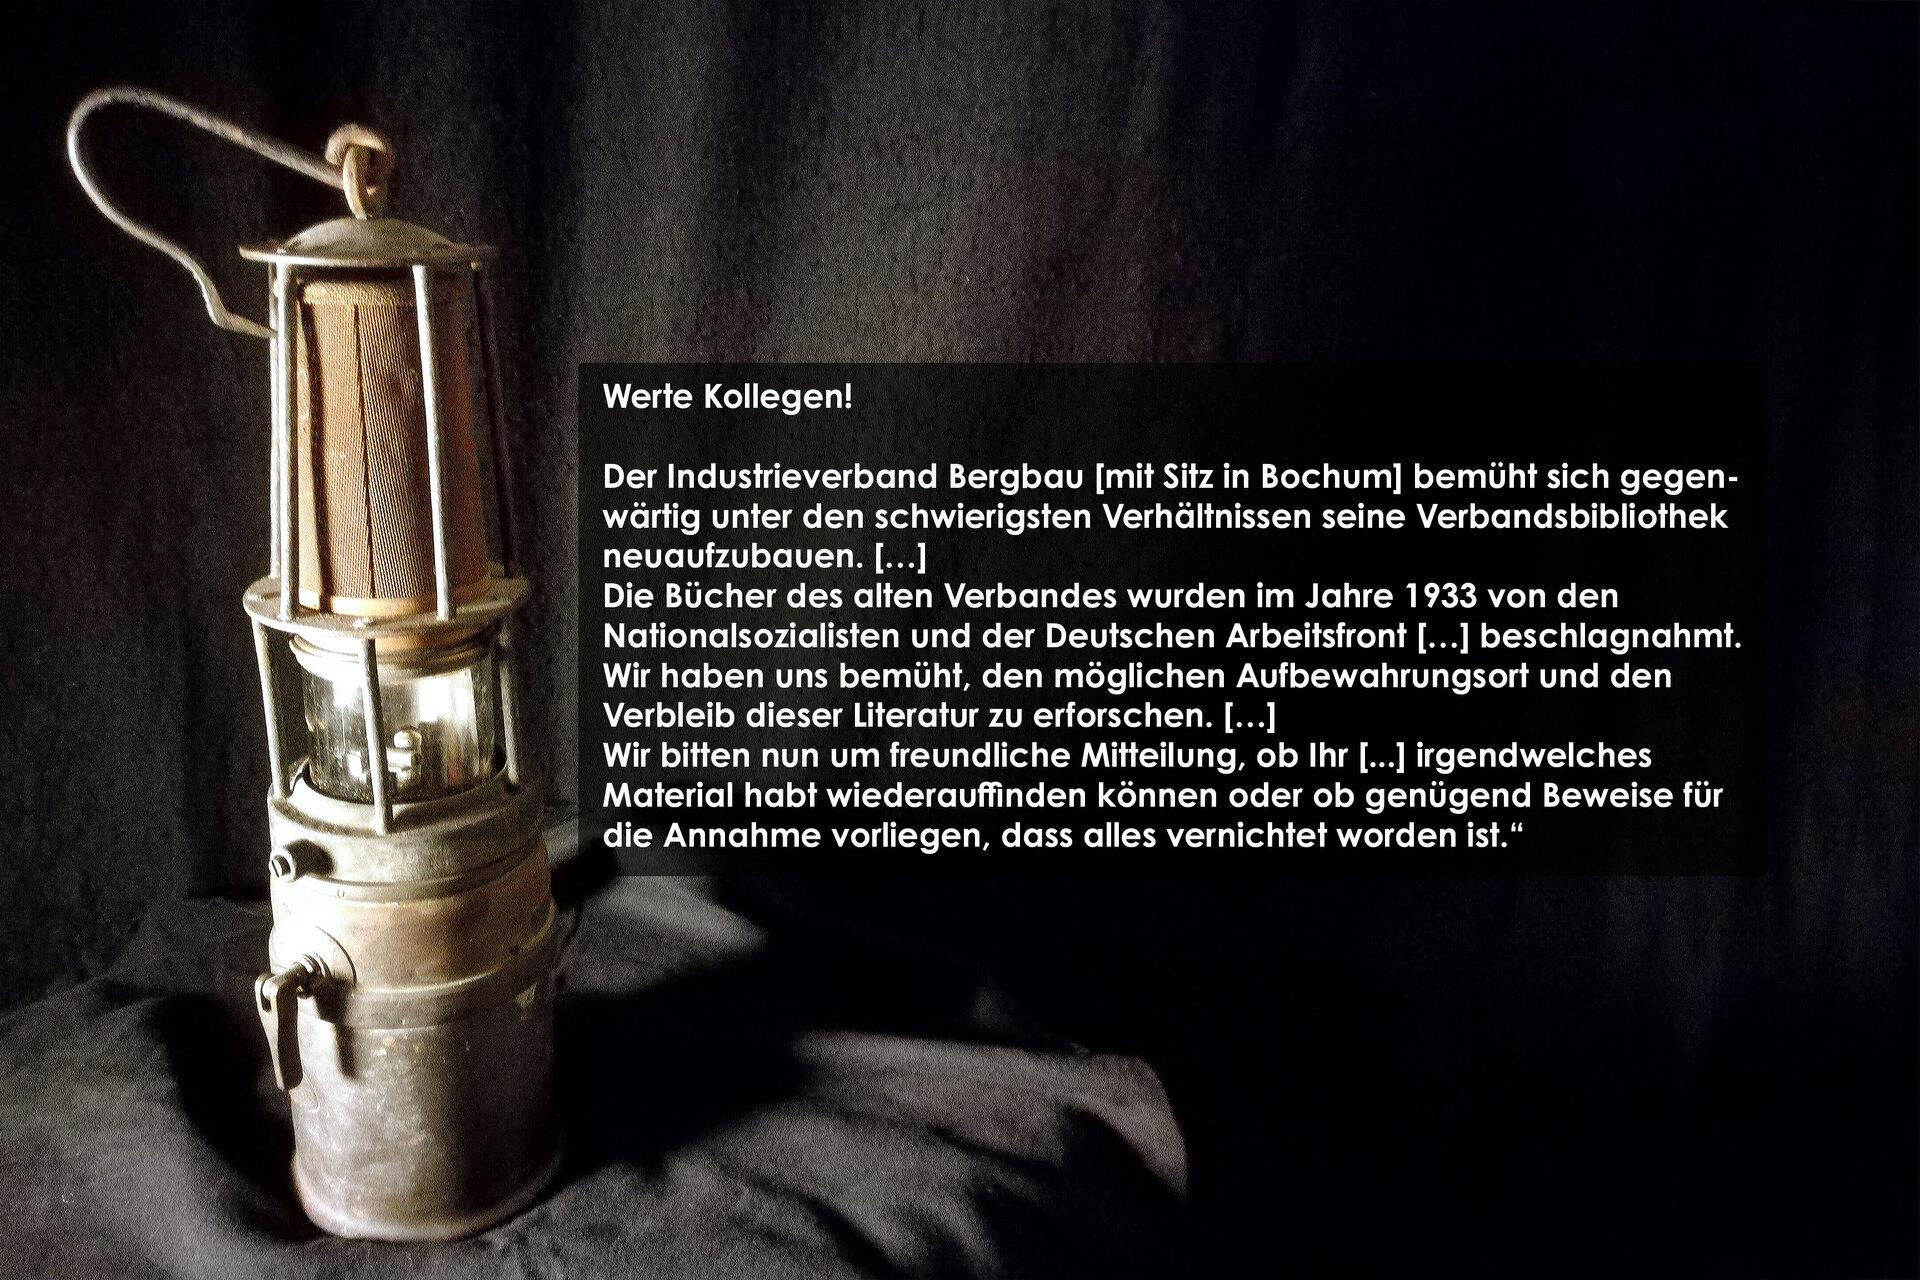 Zitate-Illu_S24-1_Industrieverb-Bergbau.jpg